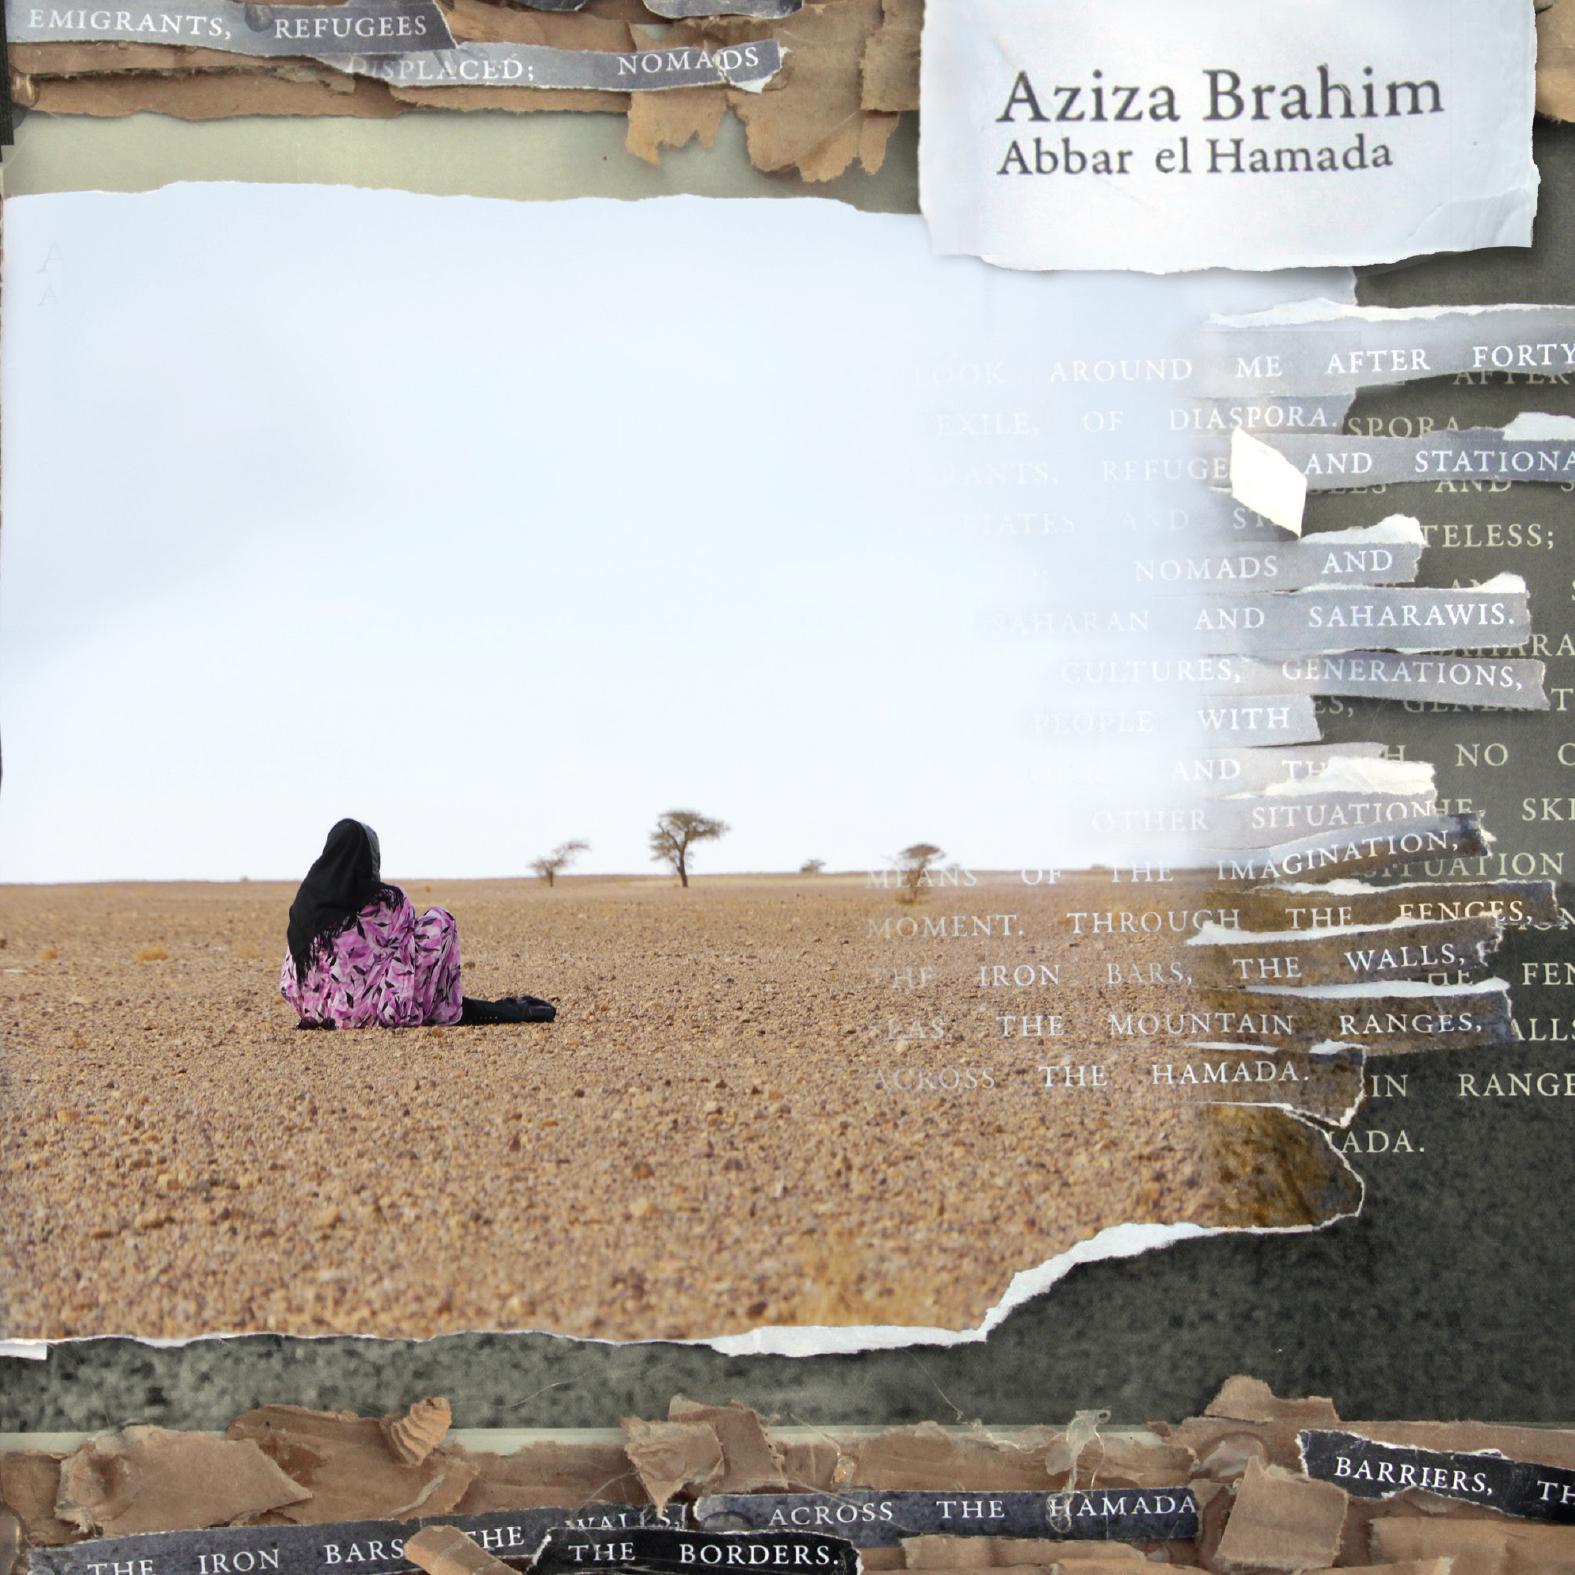 ' ' from the web at 'http://glitterbeat.com/wp-content/uploads/2015/11/02-Aziza-Brahim-Calles-de-Dajla-mp3-image.jpg'